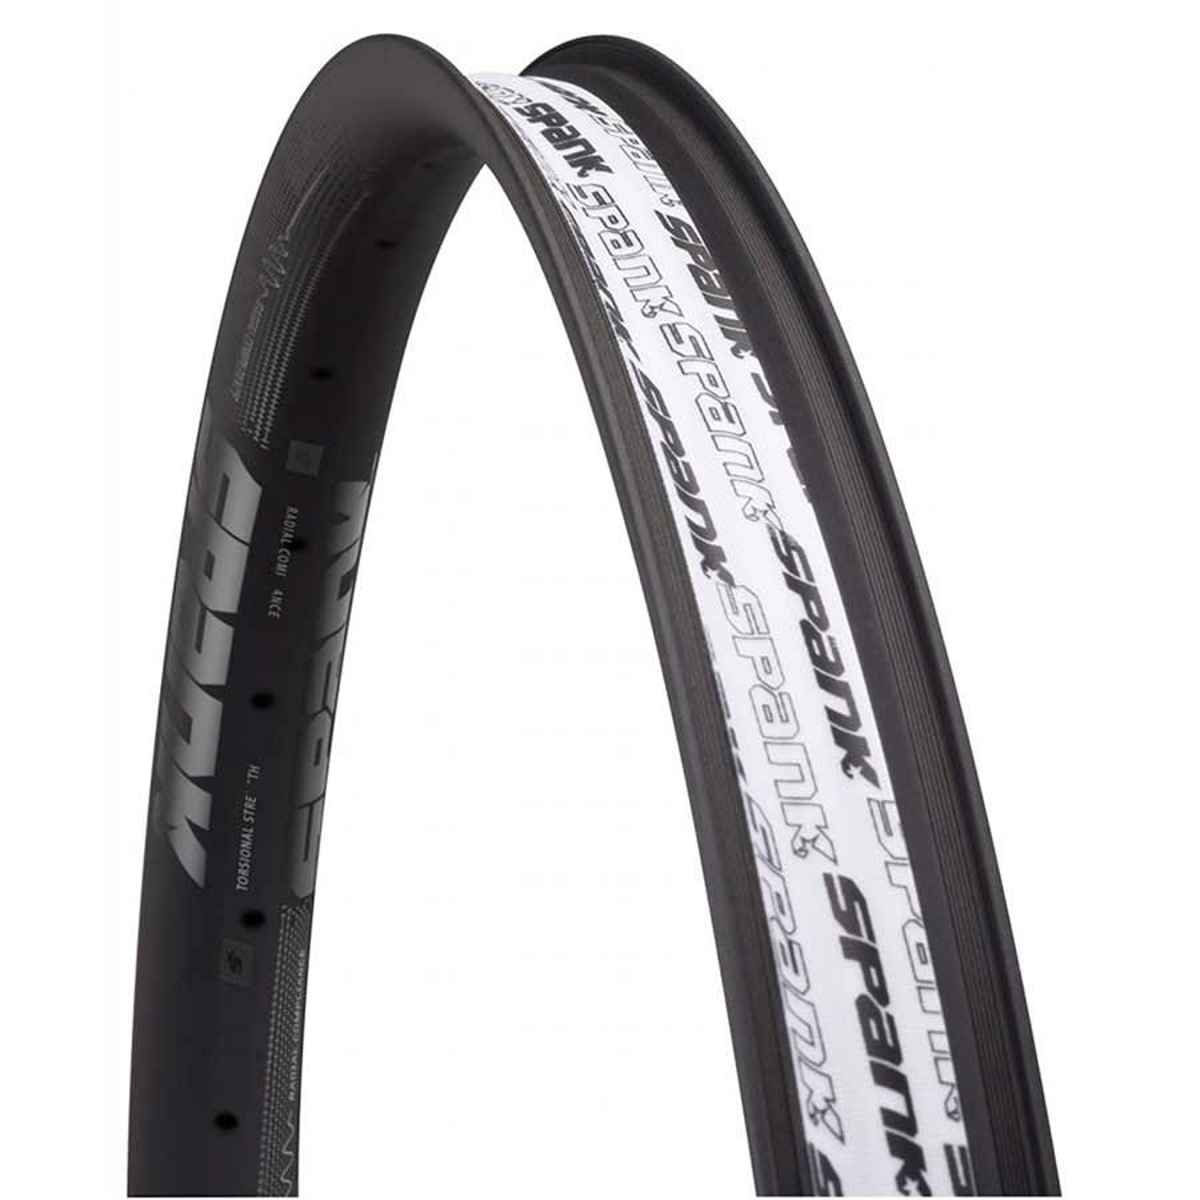 Spank Oozy 350 Rim 27.5' Iso 584 32H Aluminum - Welded Presta - Black - C02OZ356520ASPK